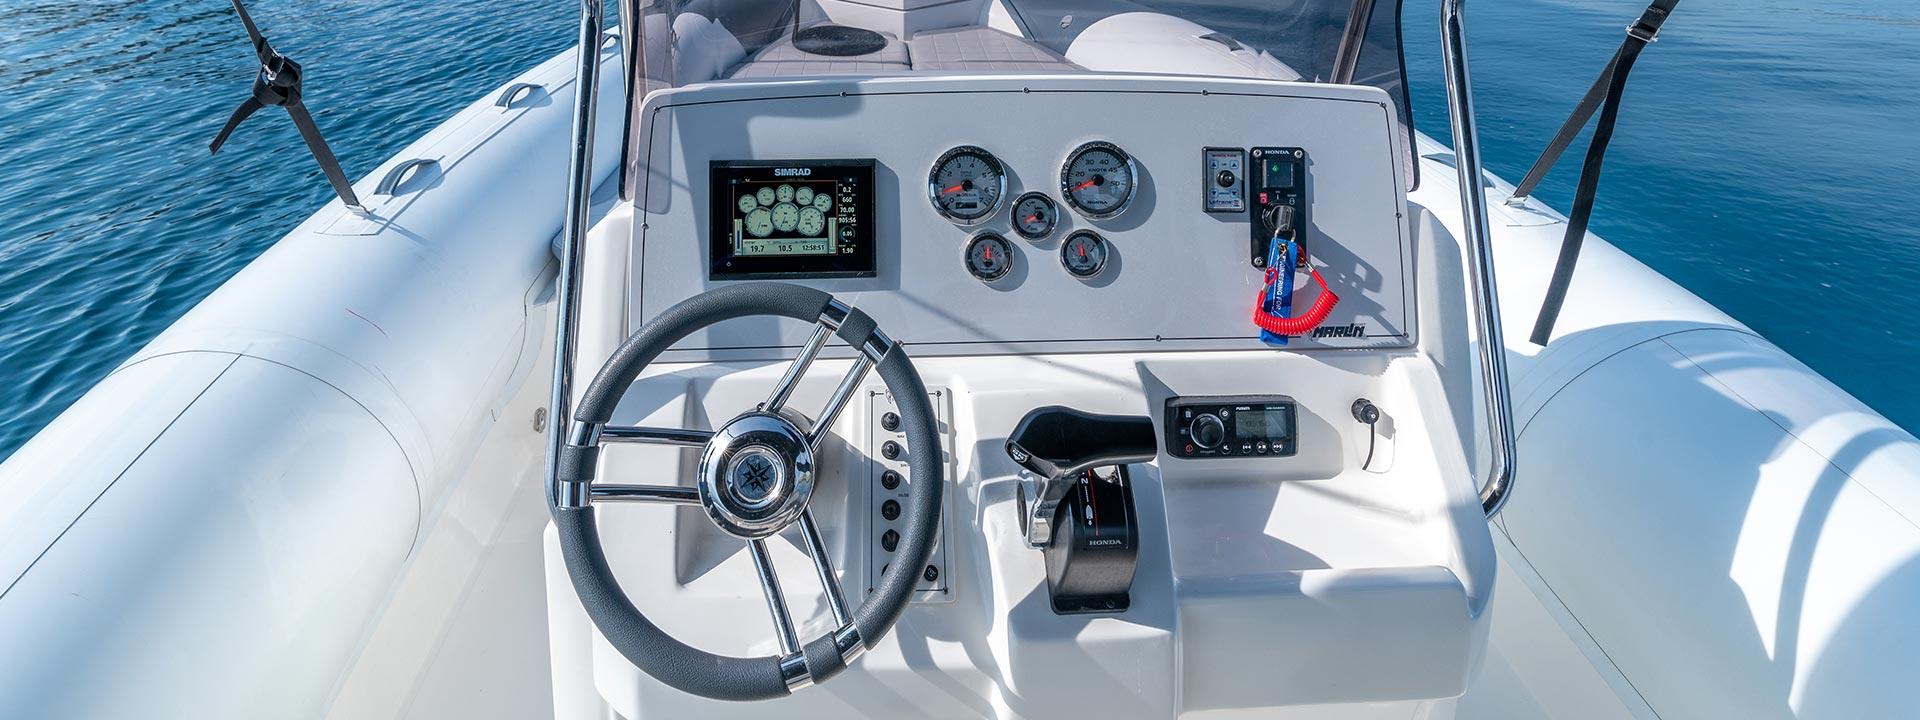 mayer-charter-boat-header-jeanneau-marlin-790-02